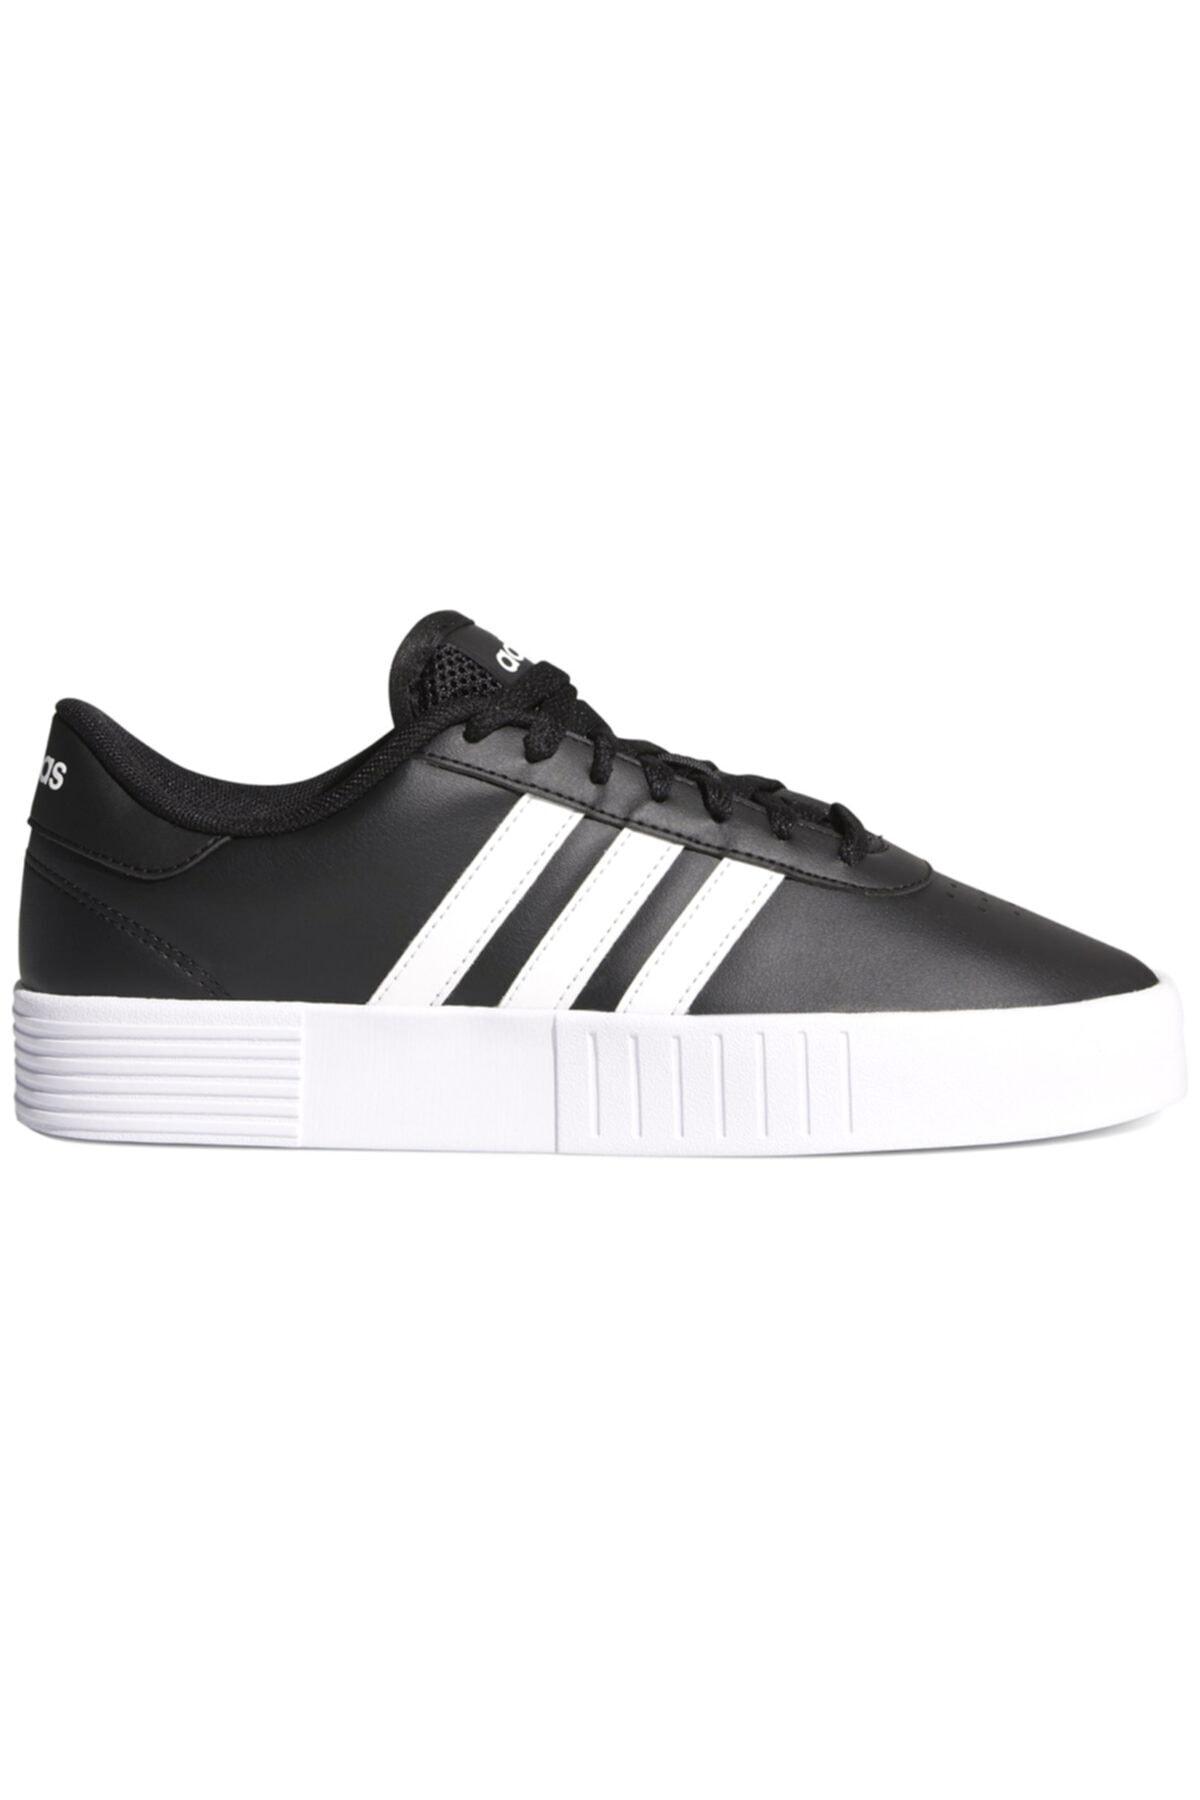 adidas COURT BOLD Siyah Kadın Sneaker Ayakkabı 100663828 1